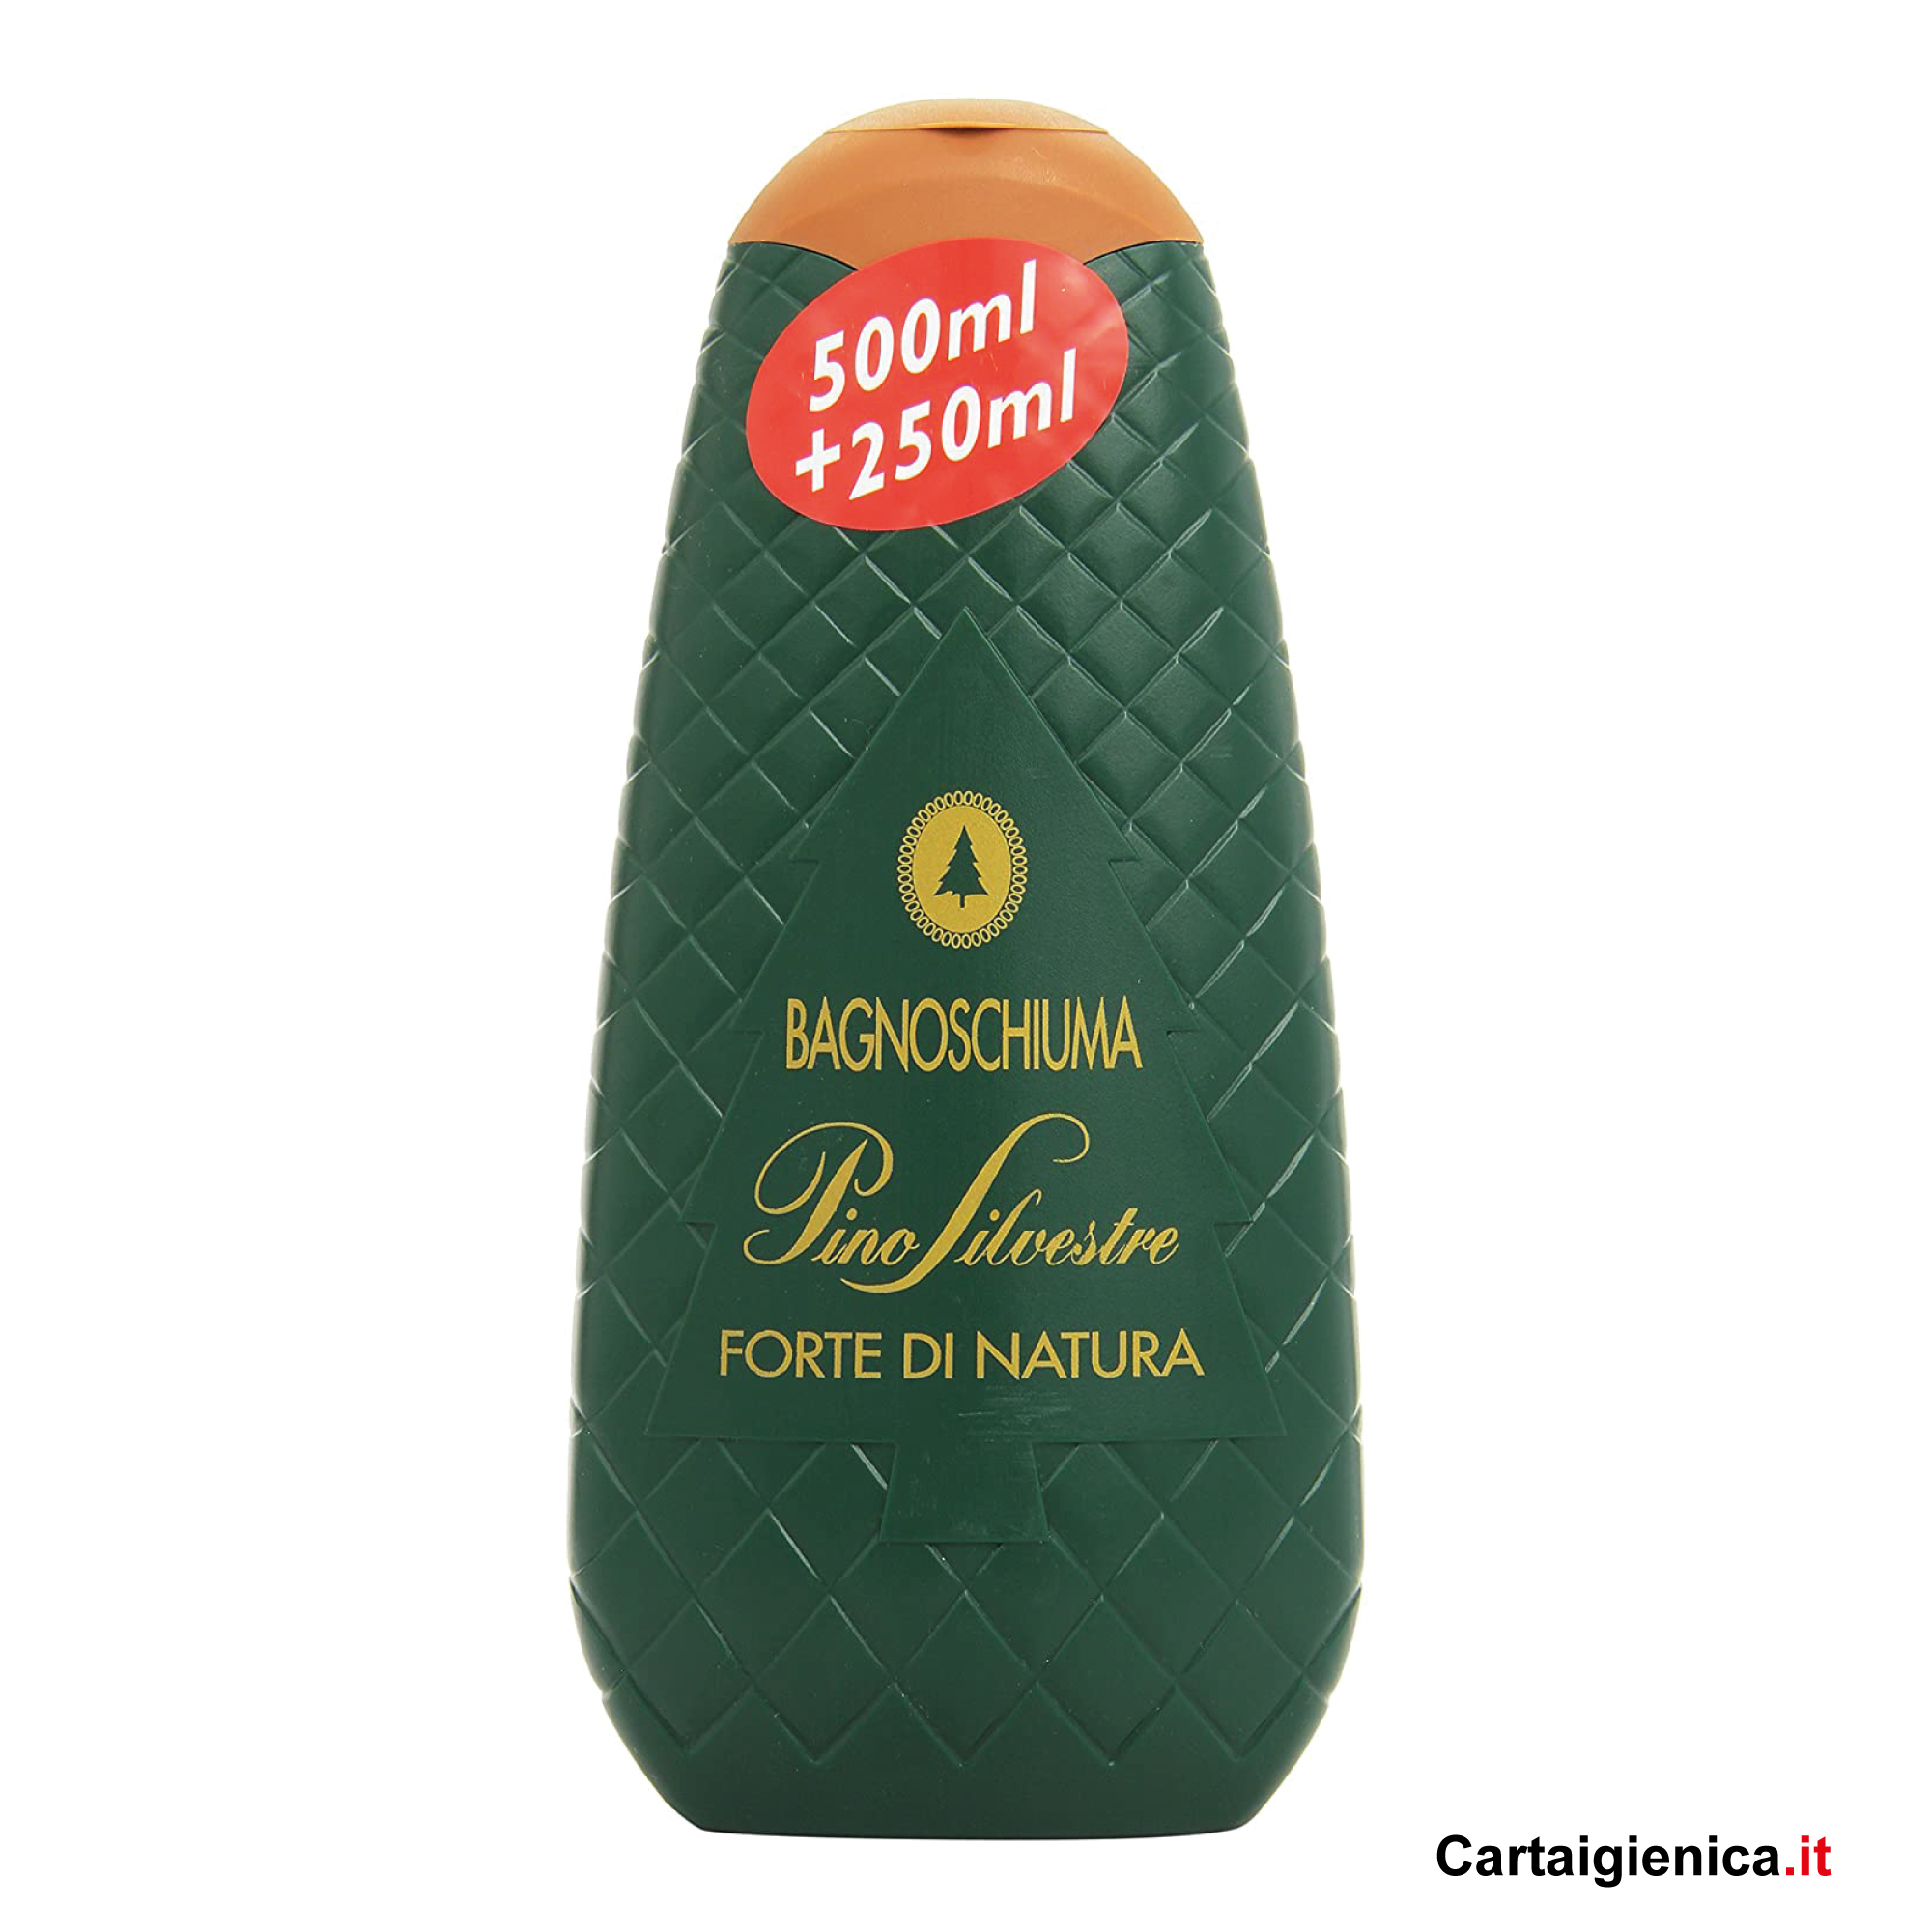 Pinosilvestre Forte di Natura Bagnoschiuma 750 ml